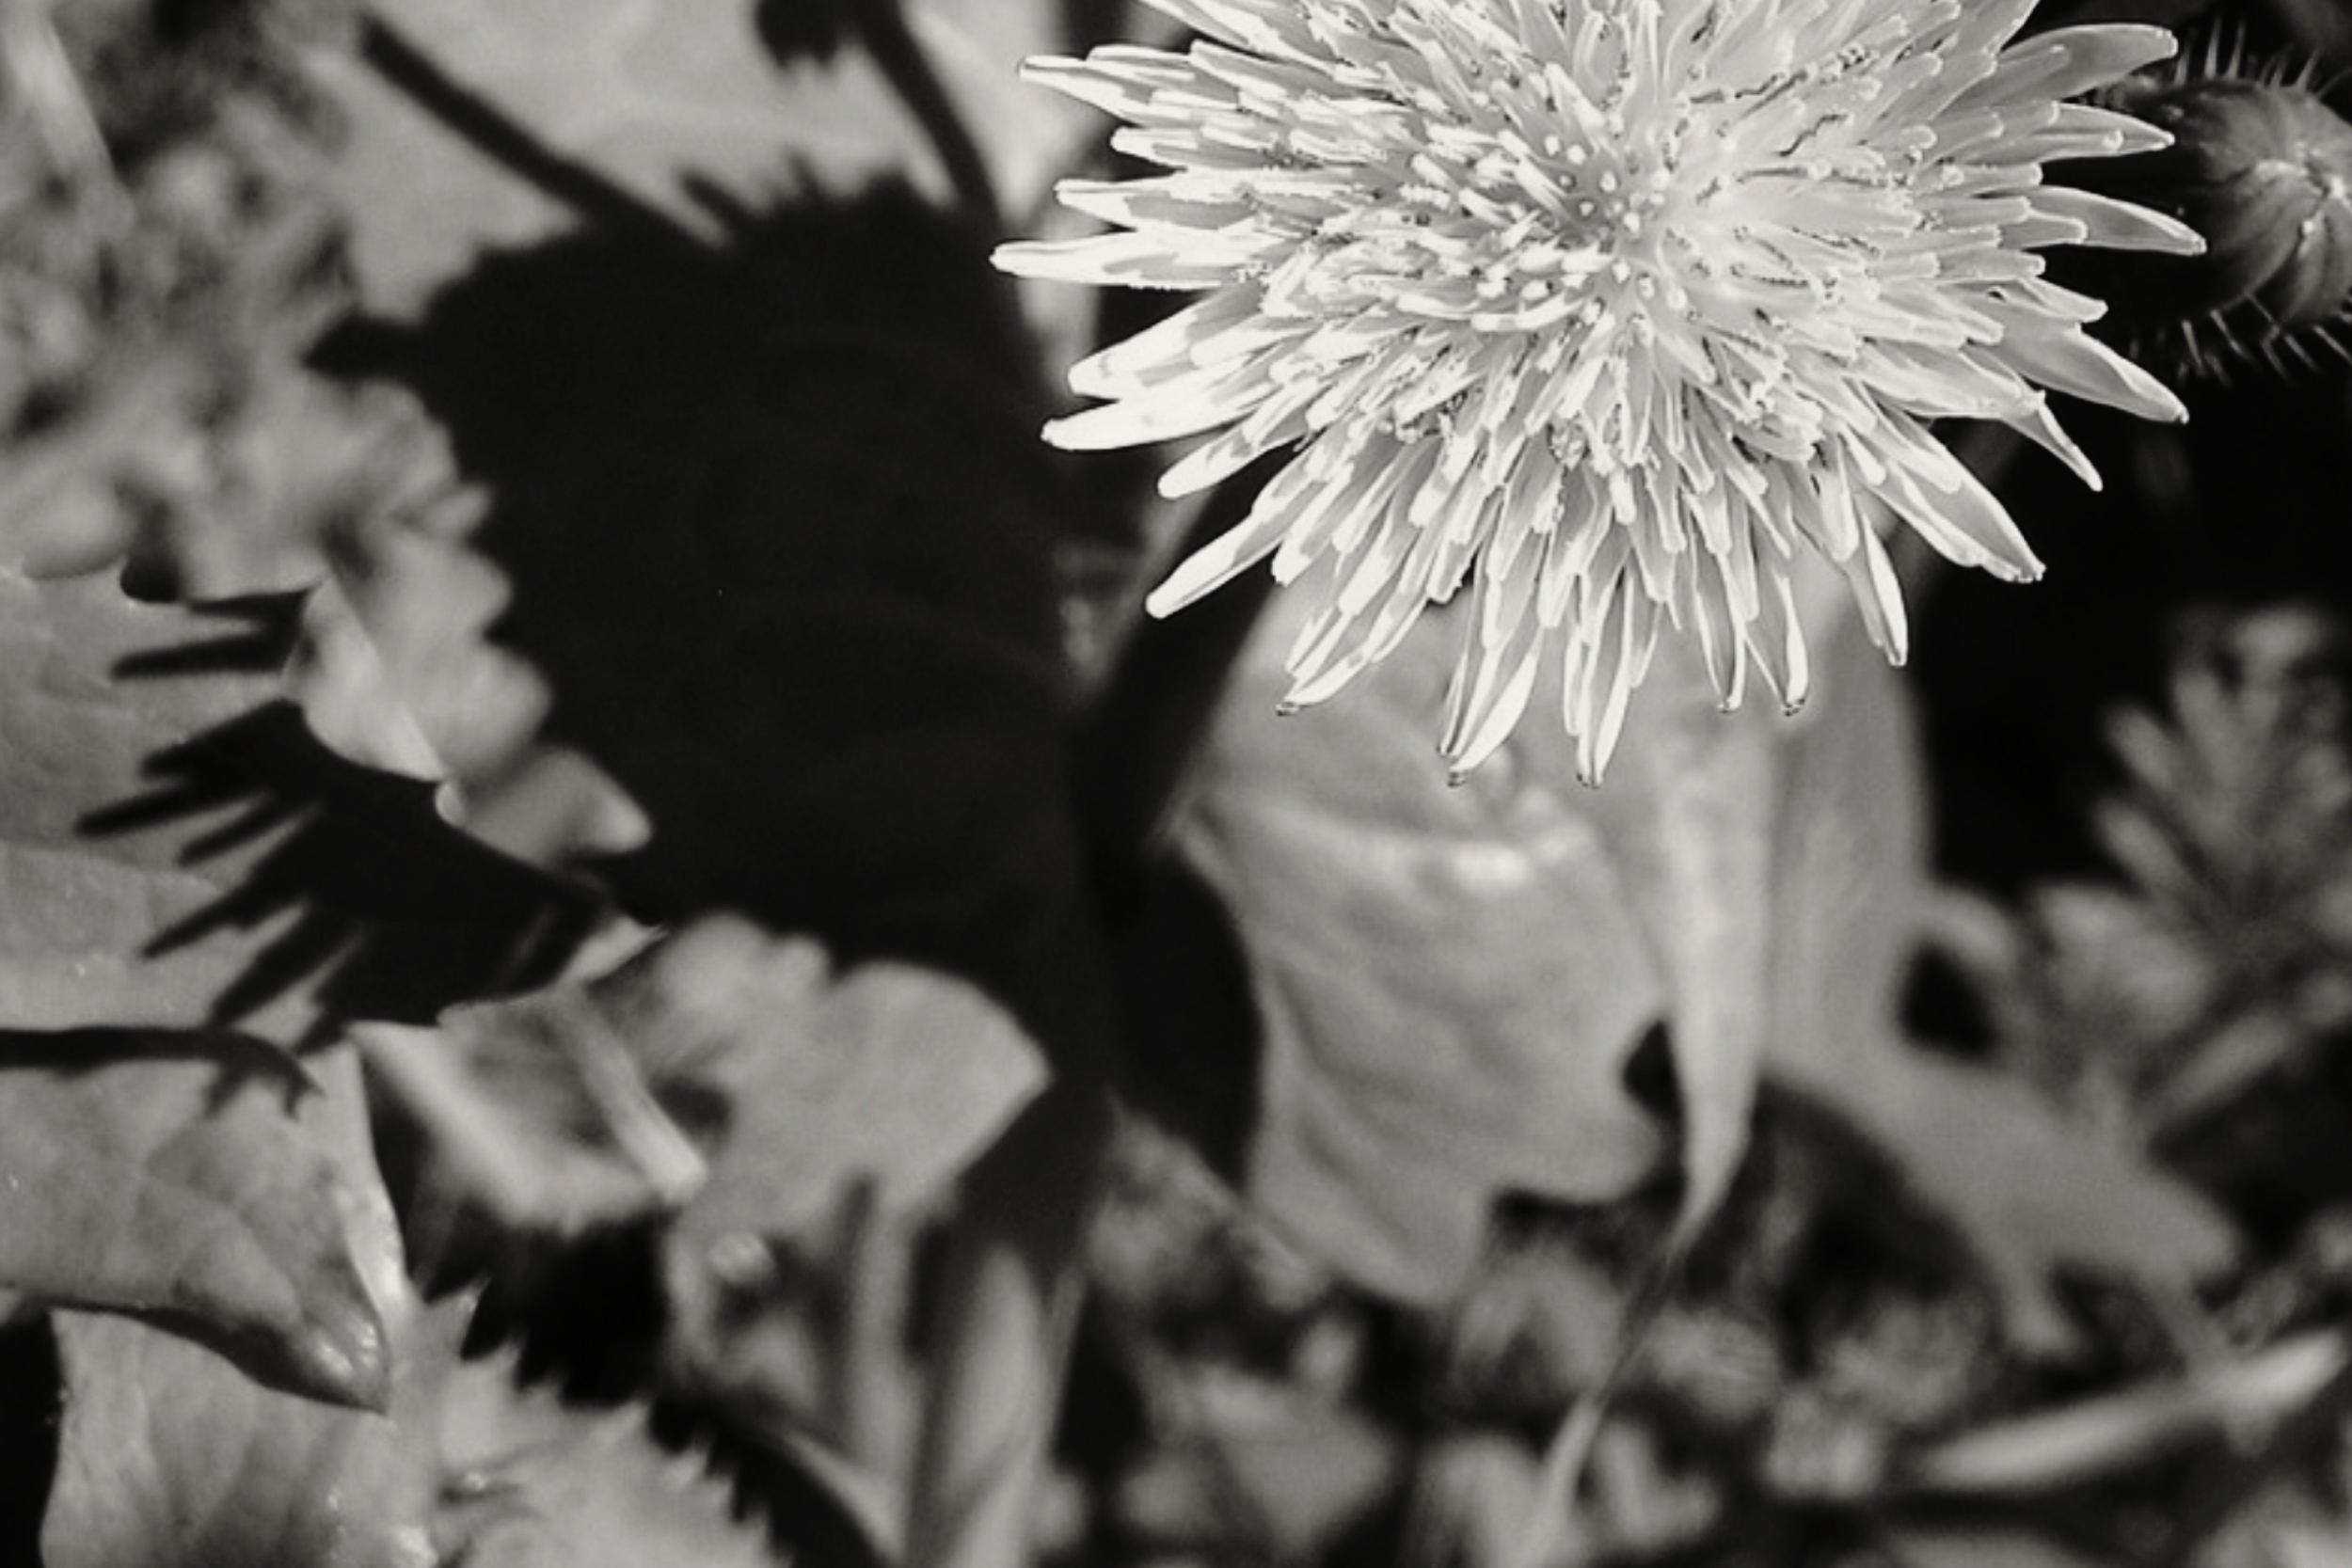 Weed Control andFERTILIZATION -